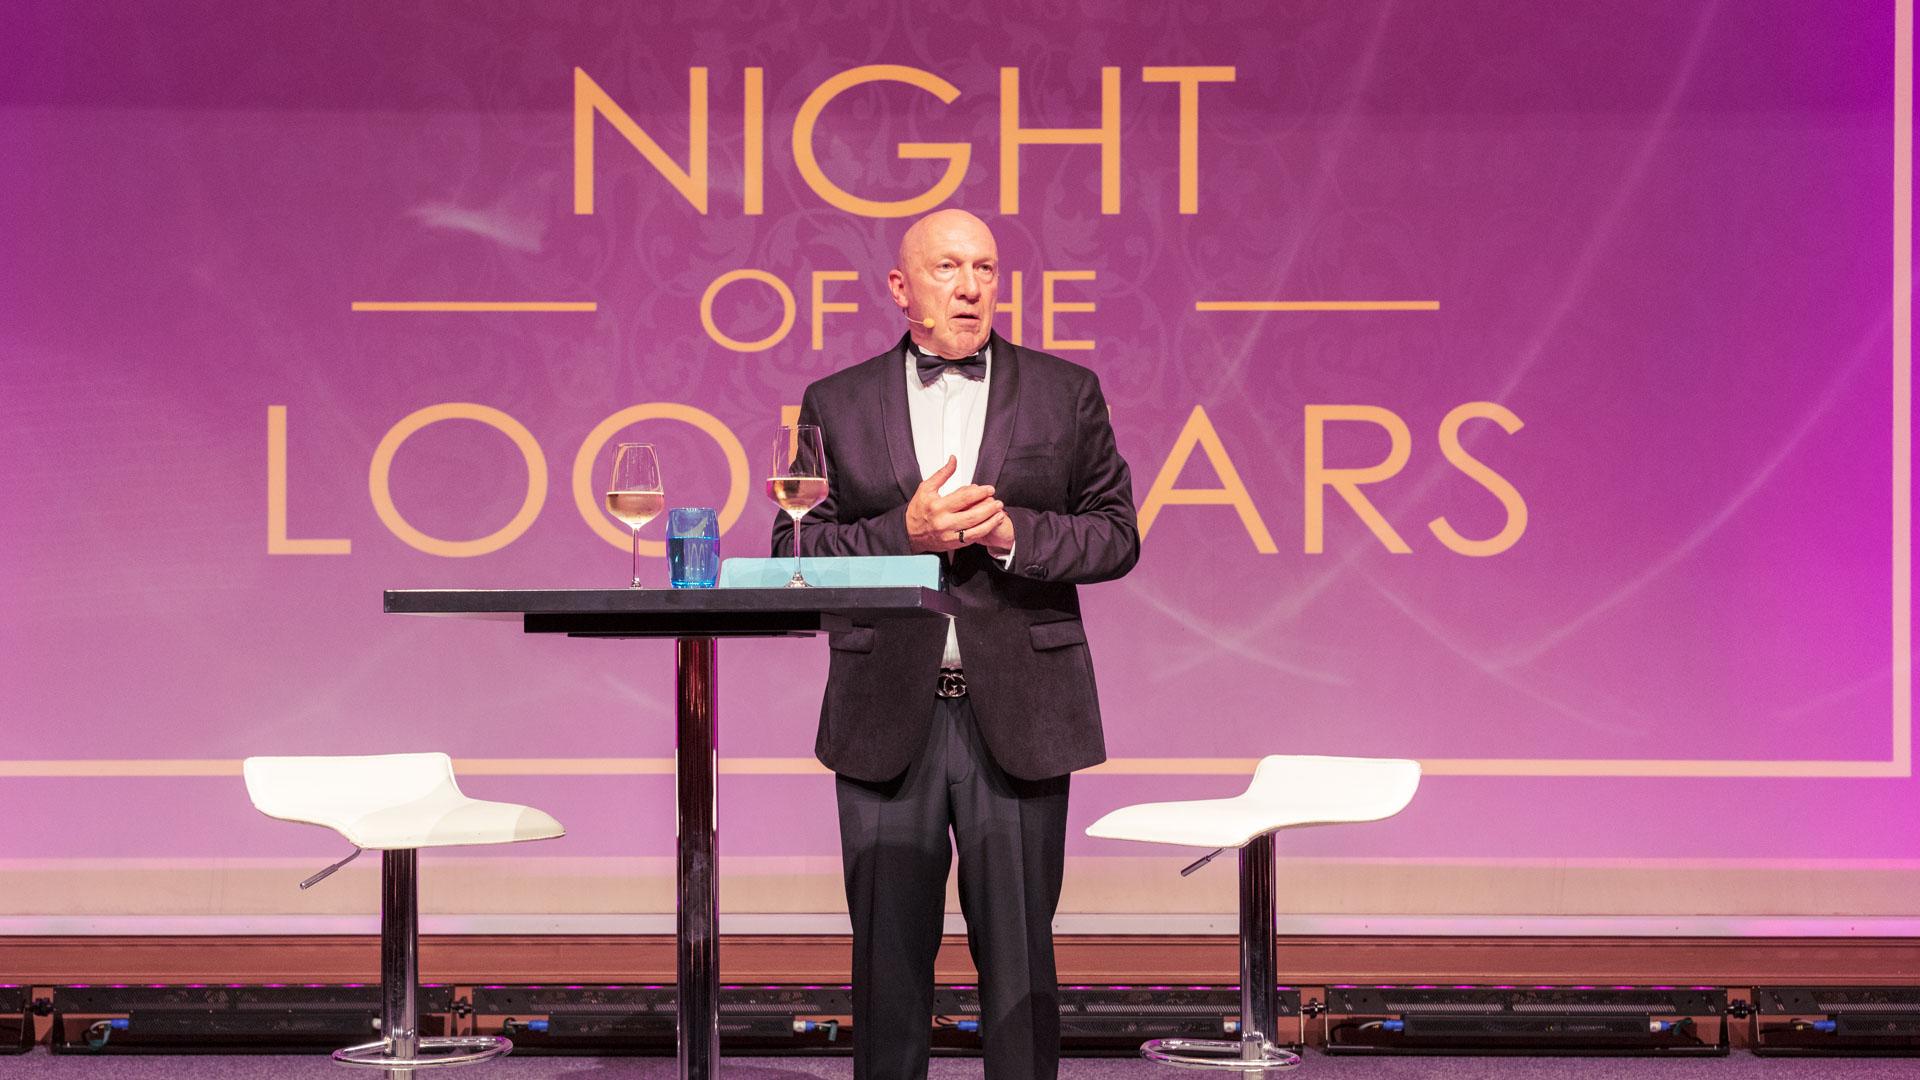 LOOP Gala Frankfurt 2021, Night of the Loopstars, mit Moderator Hans Gesk